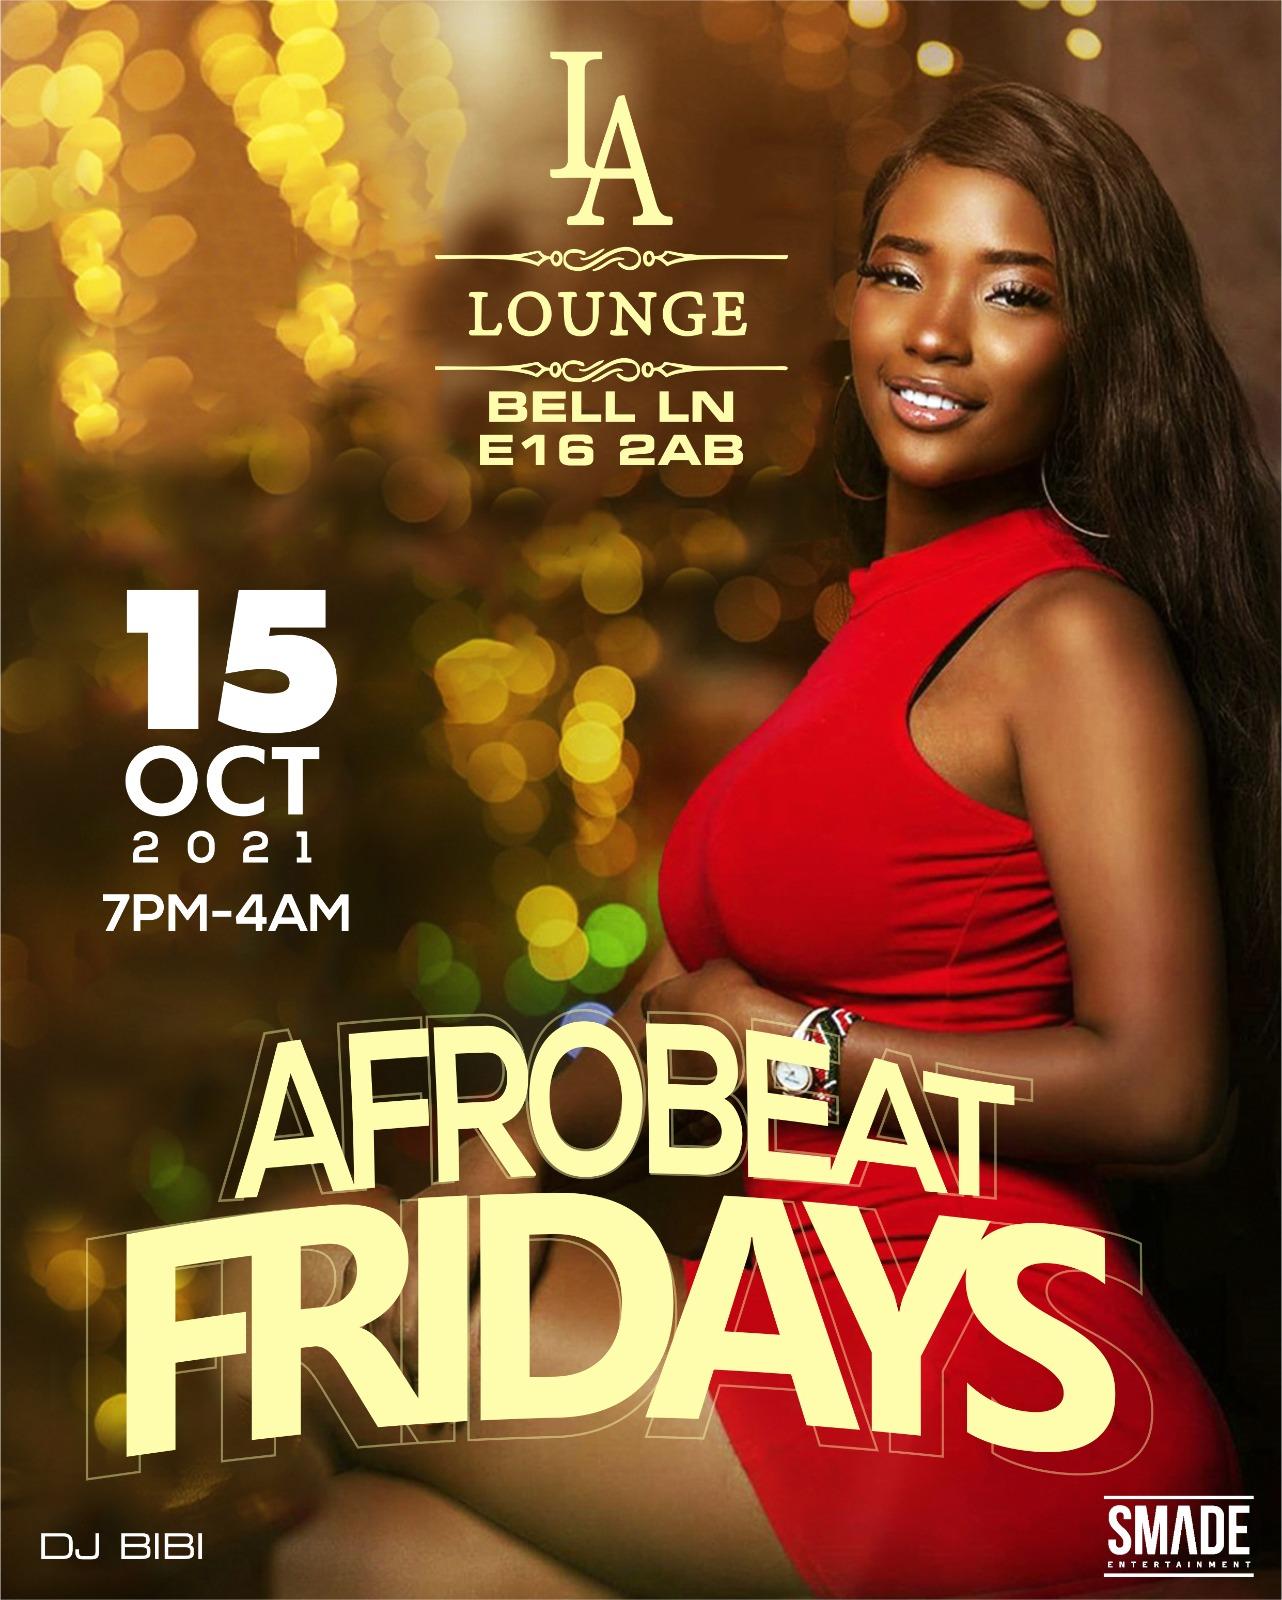 AfroBeat Fridays OCT 15